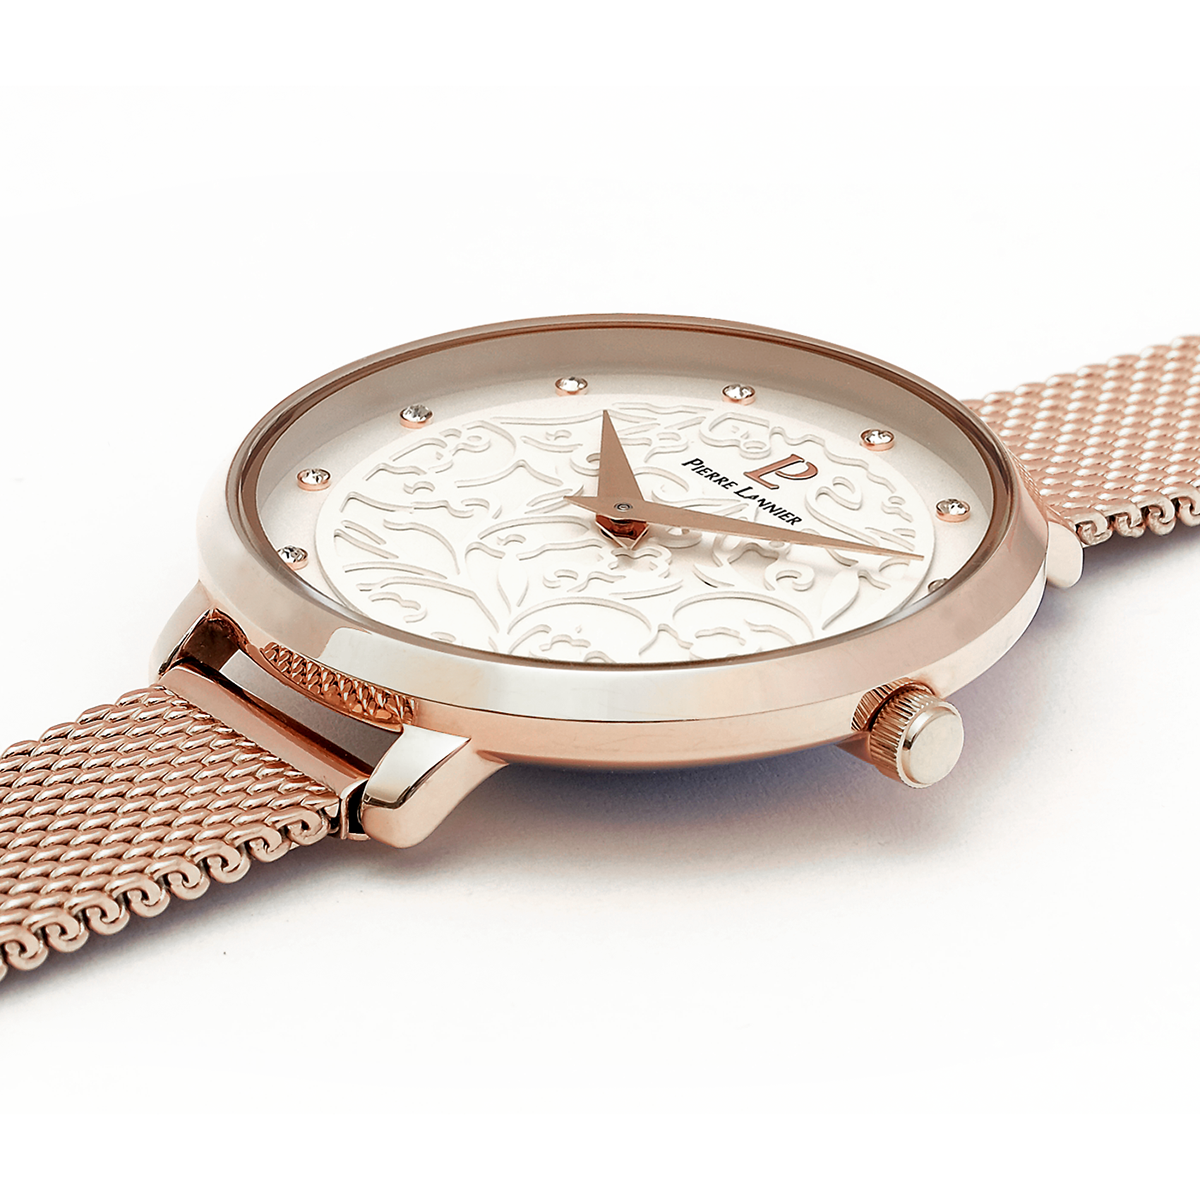 Женские часы Pierre Lannier Eolia Box 360G908